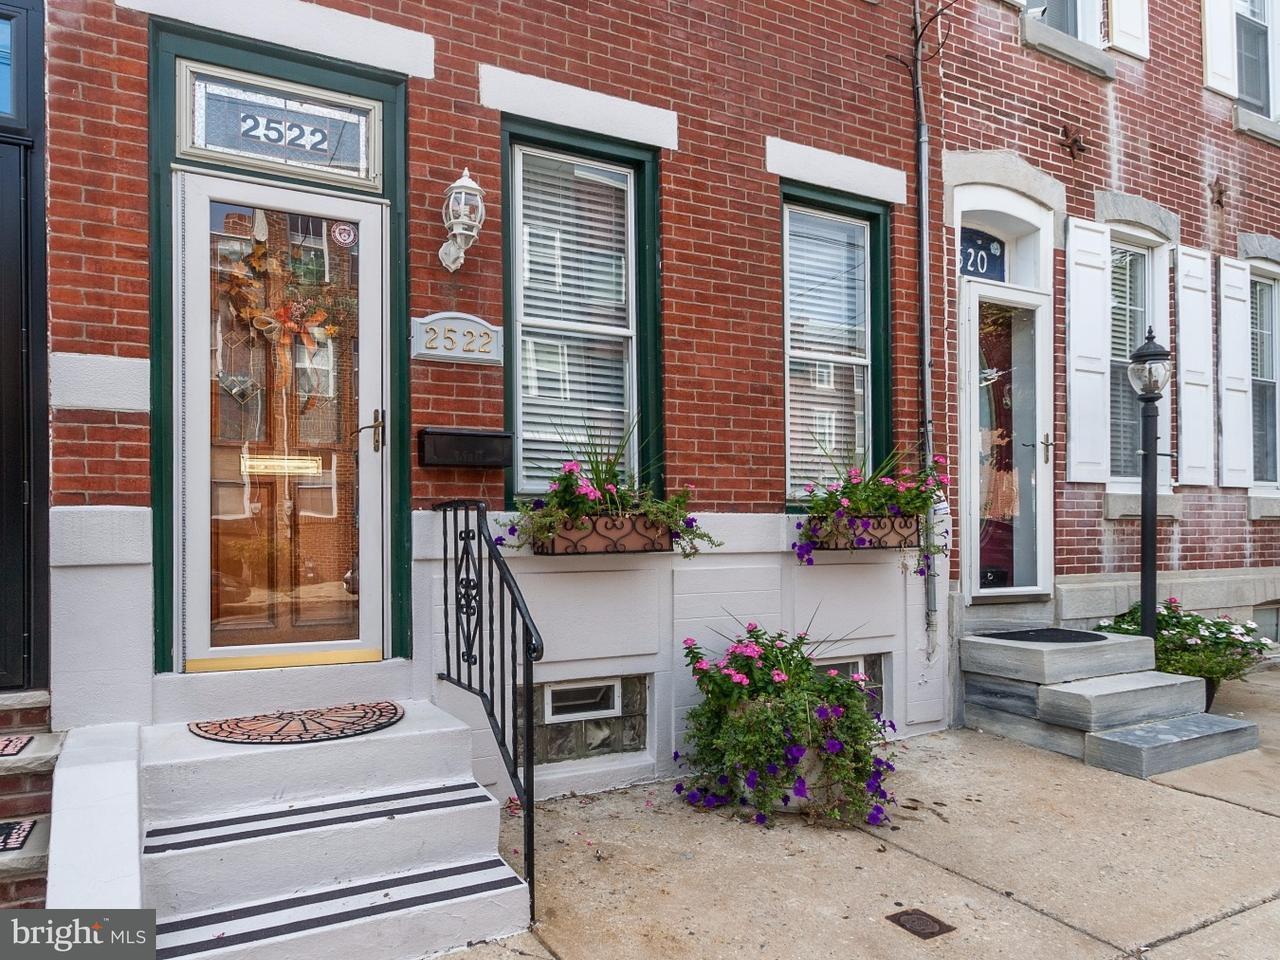 2522 E Norris Street Philadelphia, PA 19125